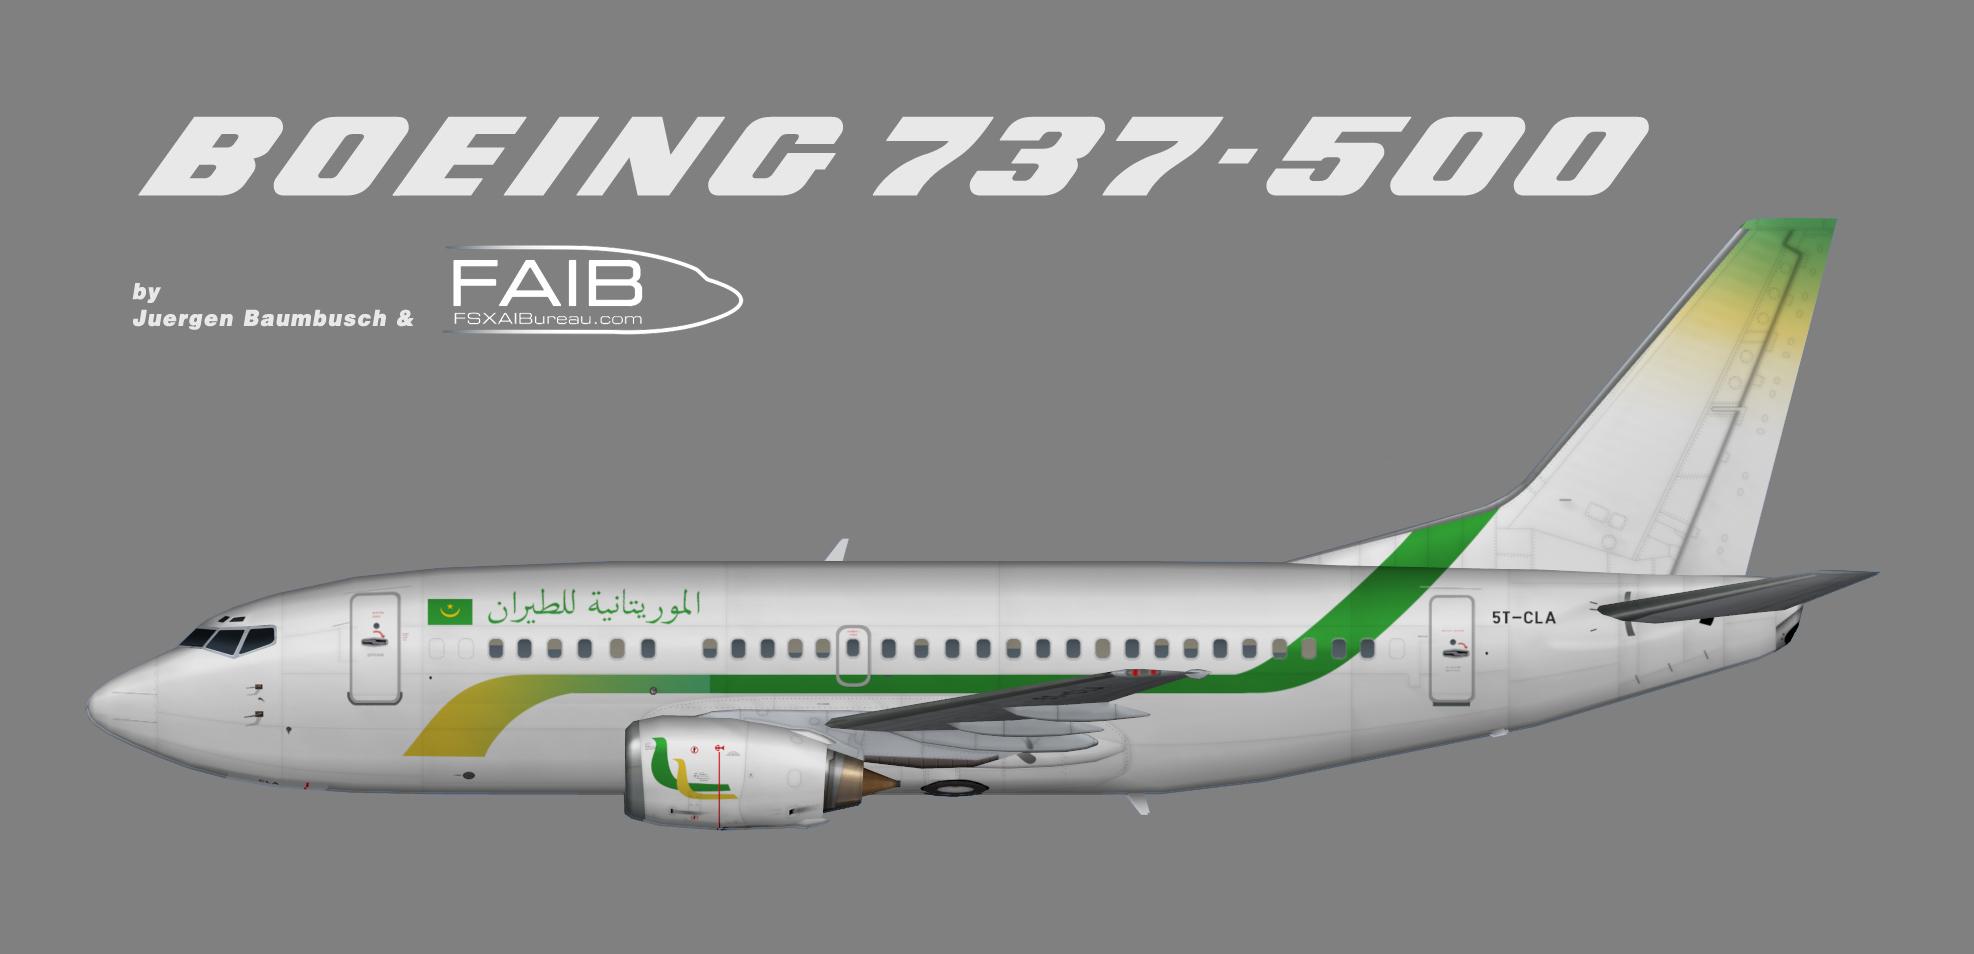 Mauritania Airlines Boeing 737-500